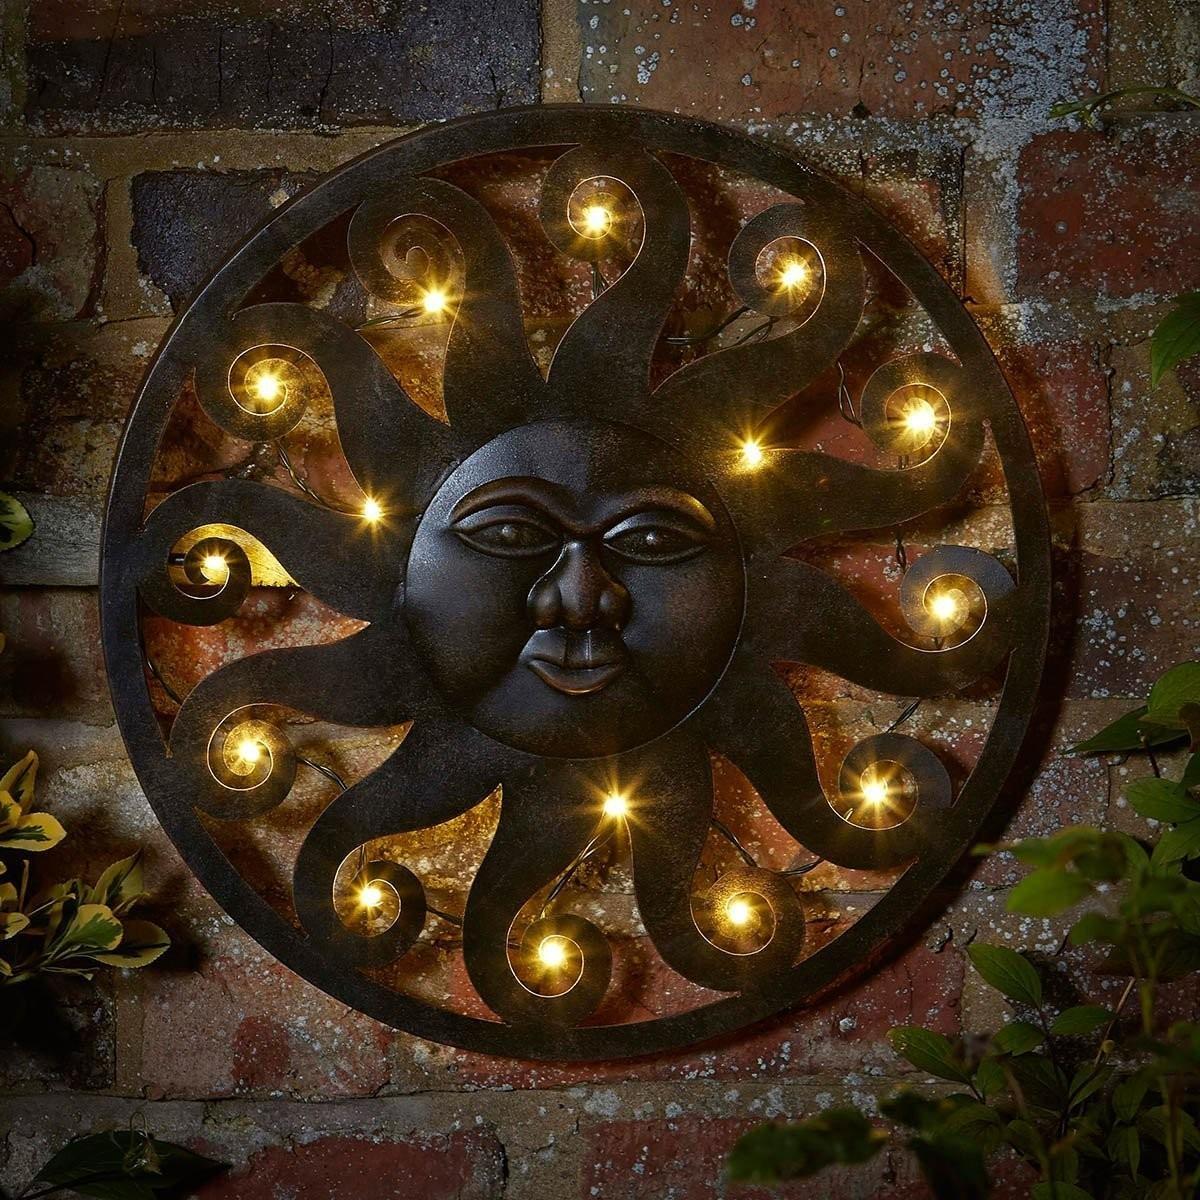 20 ideas of outdoor buddha wall art wall art ideas for Outdoor buddha